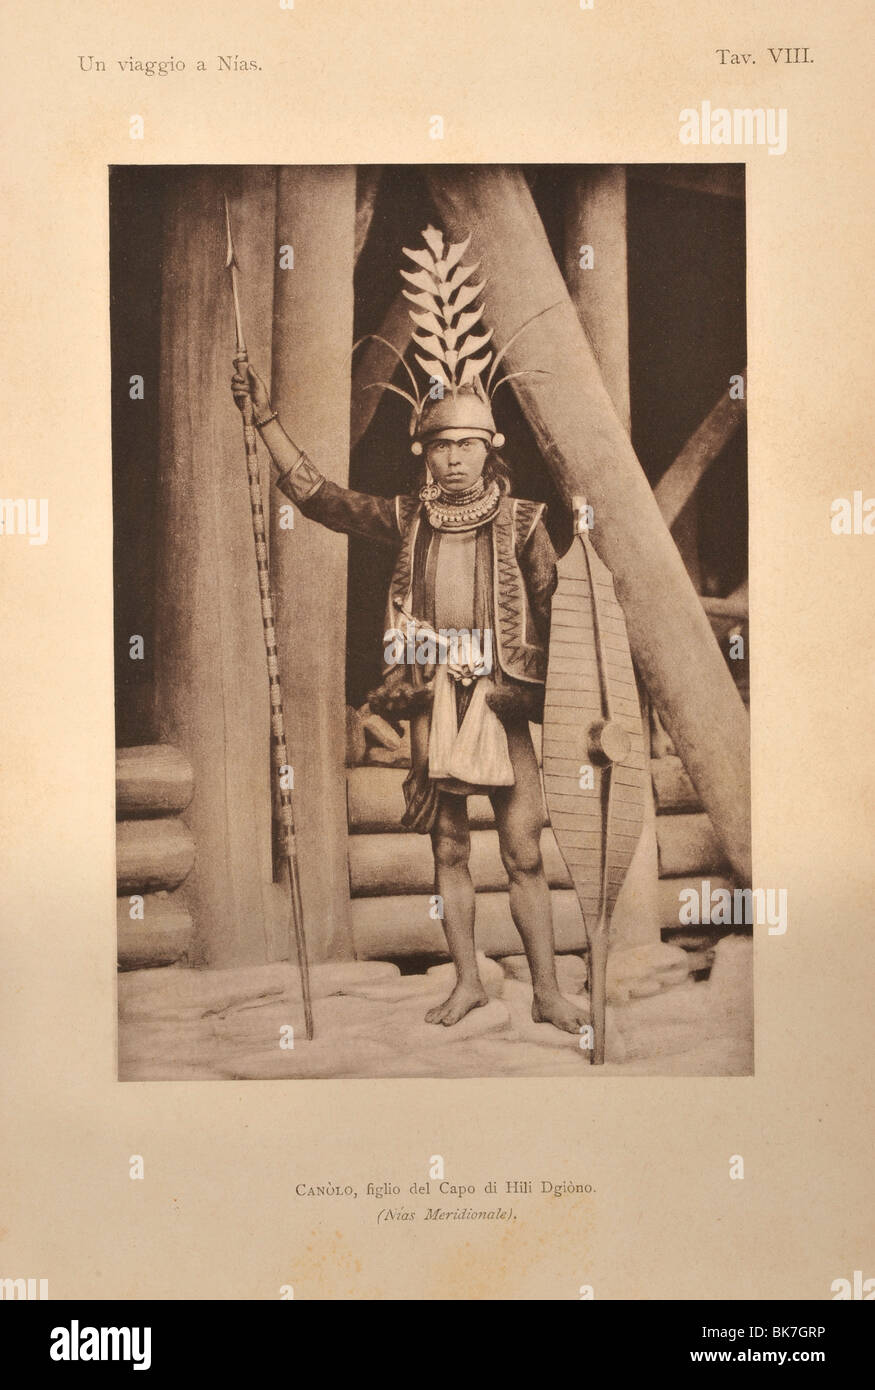 Nias Chieftain, from Viaggio a Nias, Modigliani, 1900, Indonesia, Southeast Asia, Asia - Stock Image